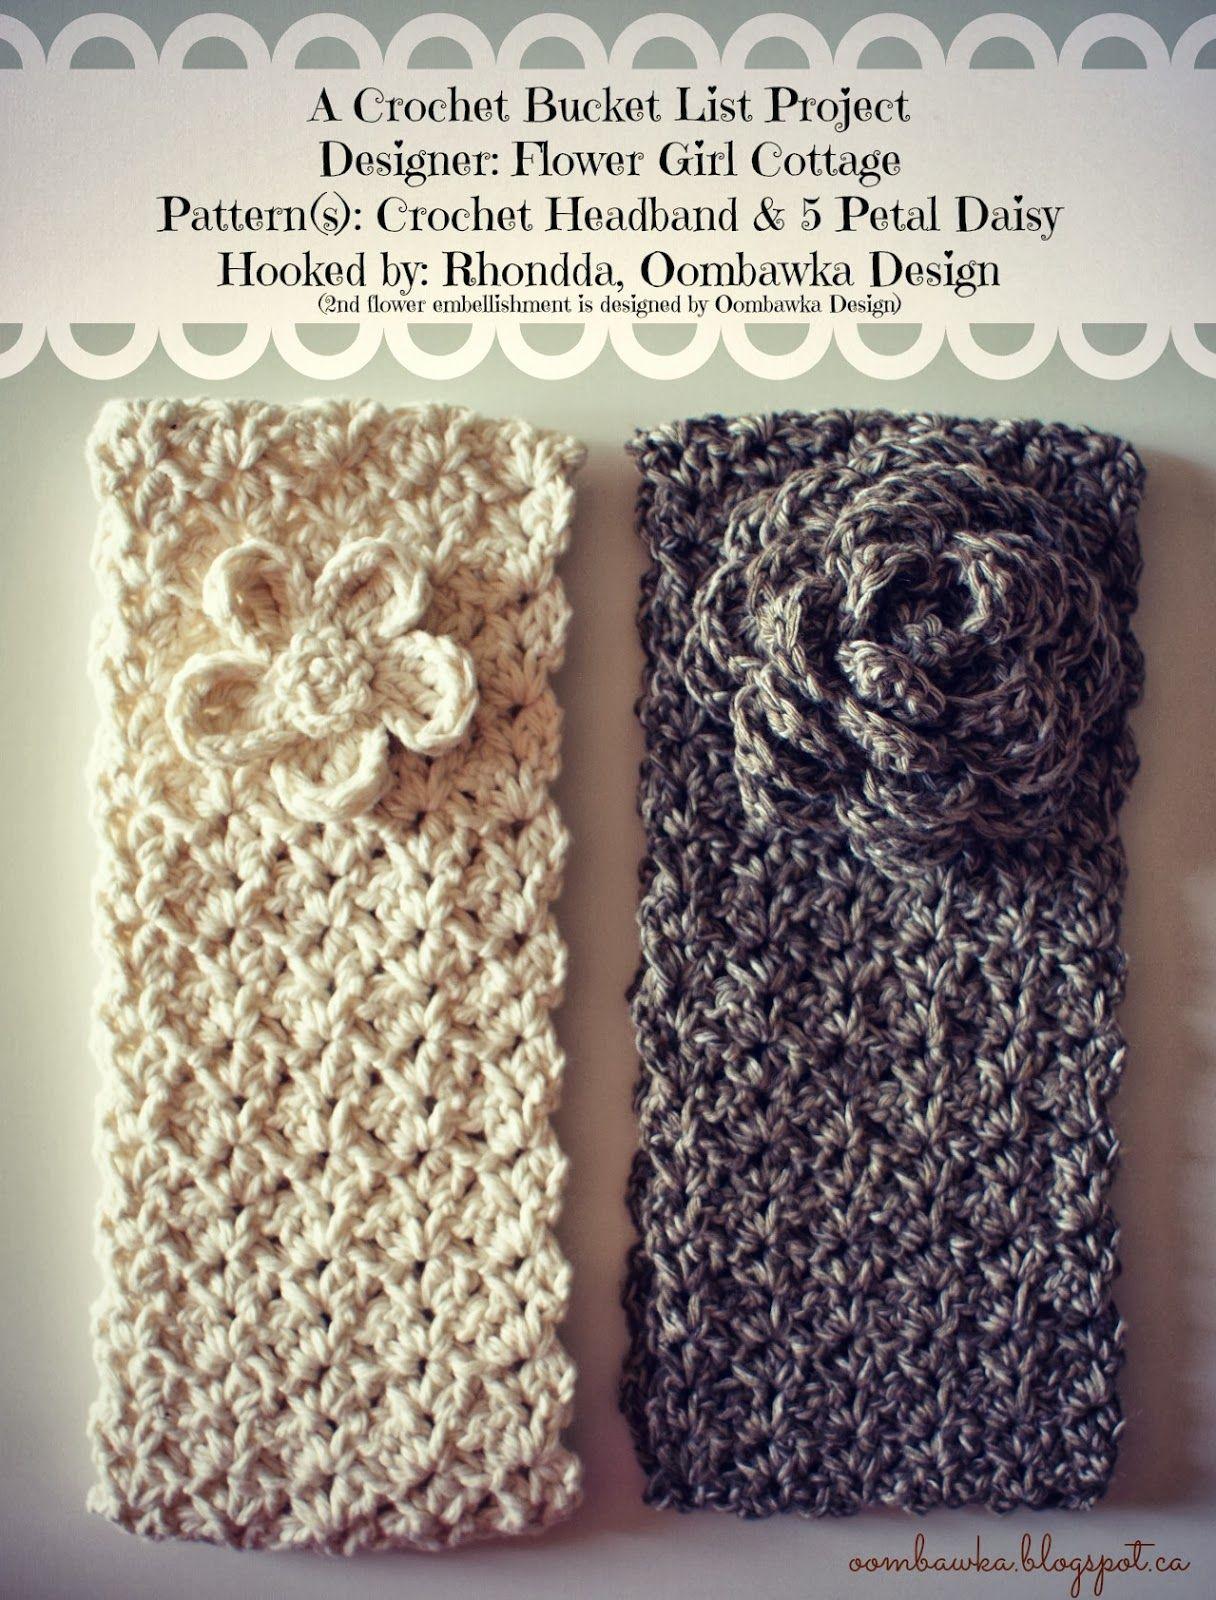 Crochet Headband And 5 Petal Daisy Crafts Crochet Pinterest